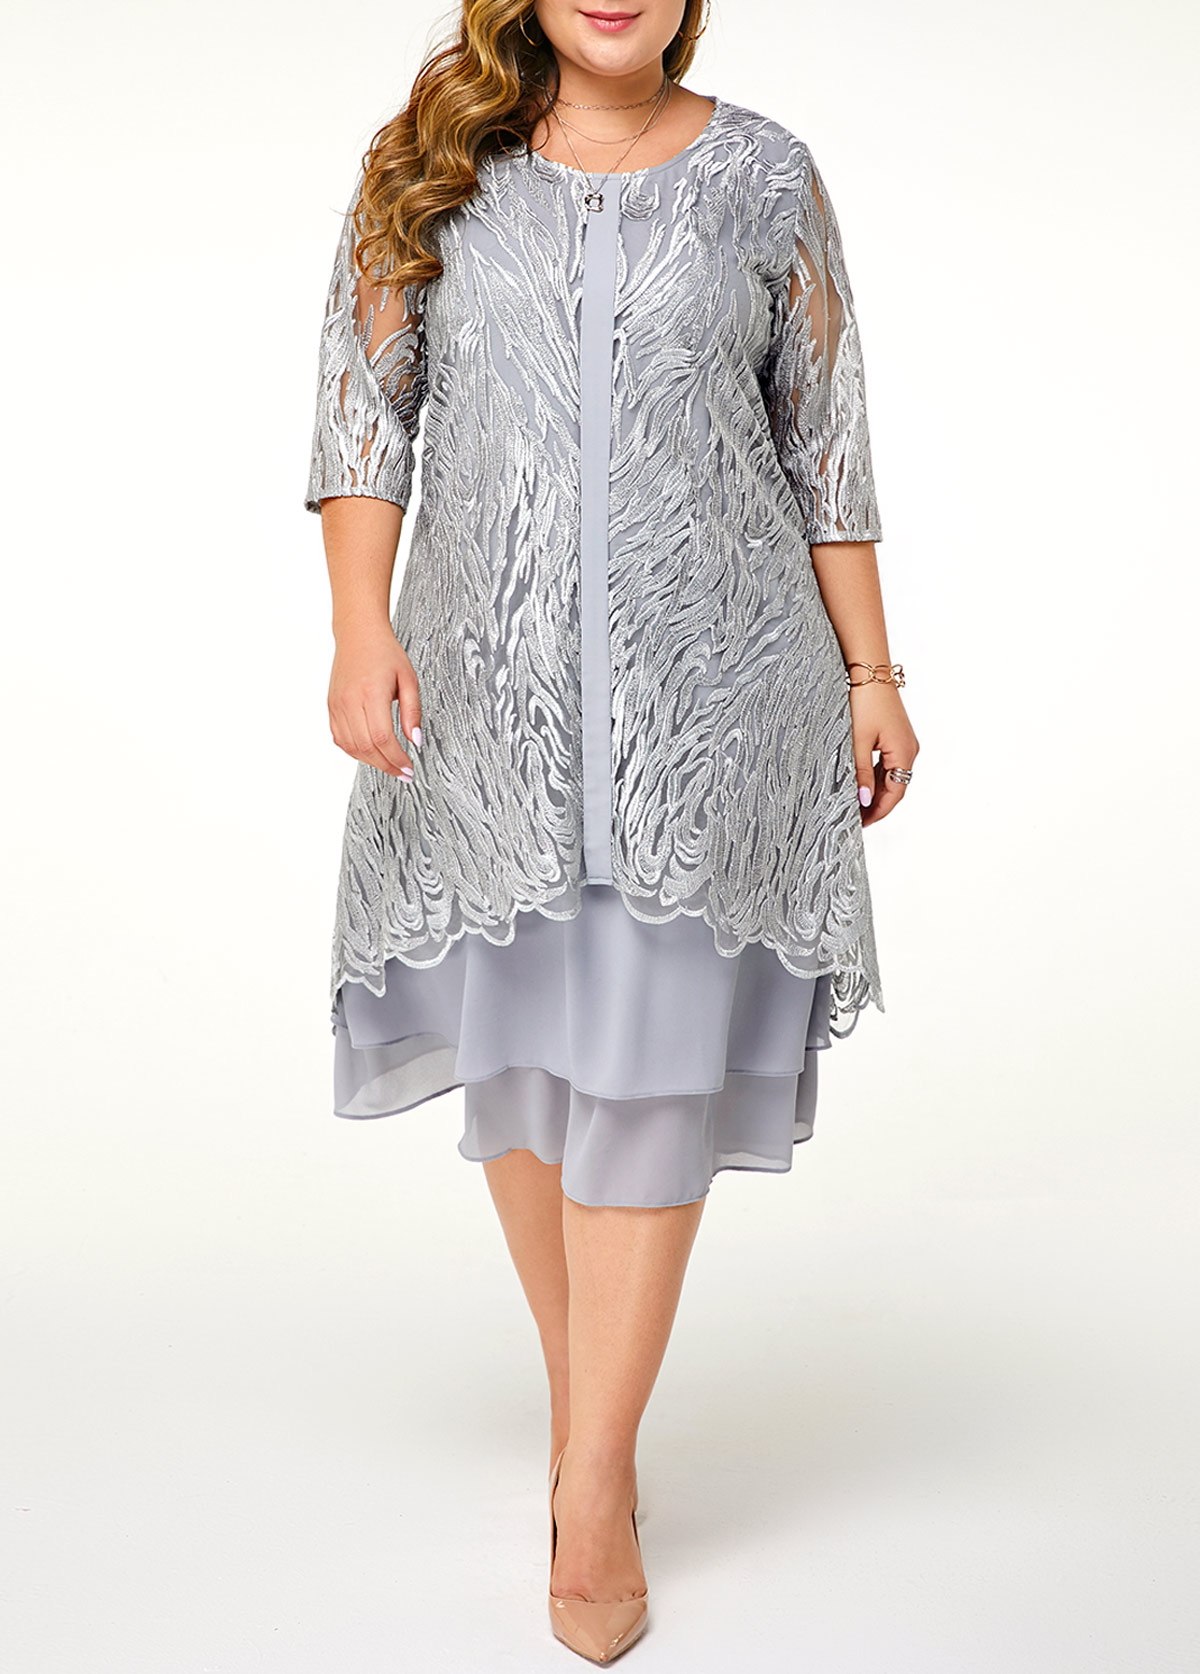 Plus Size Lace Patchwork Three Quarter Sleeve Dress